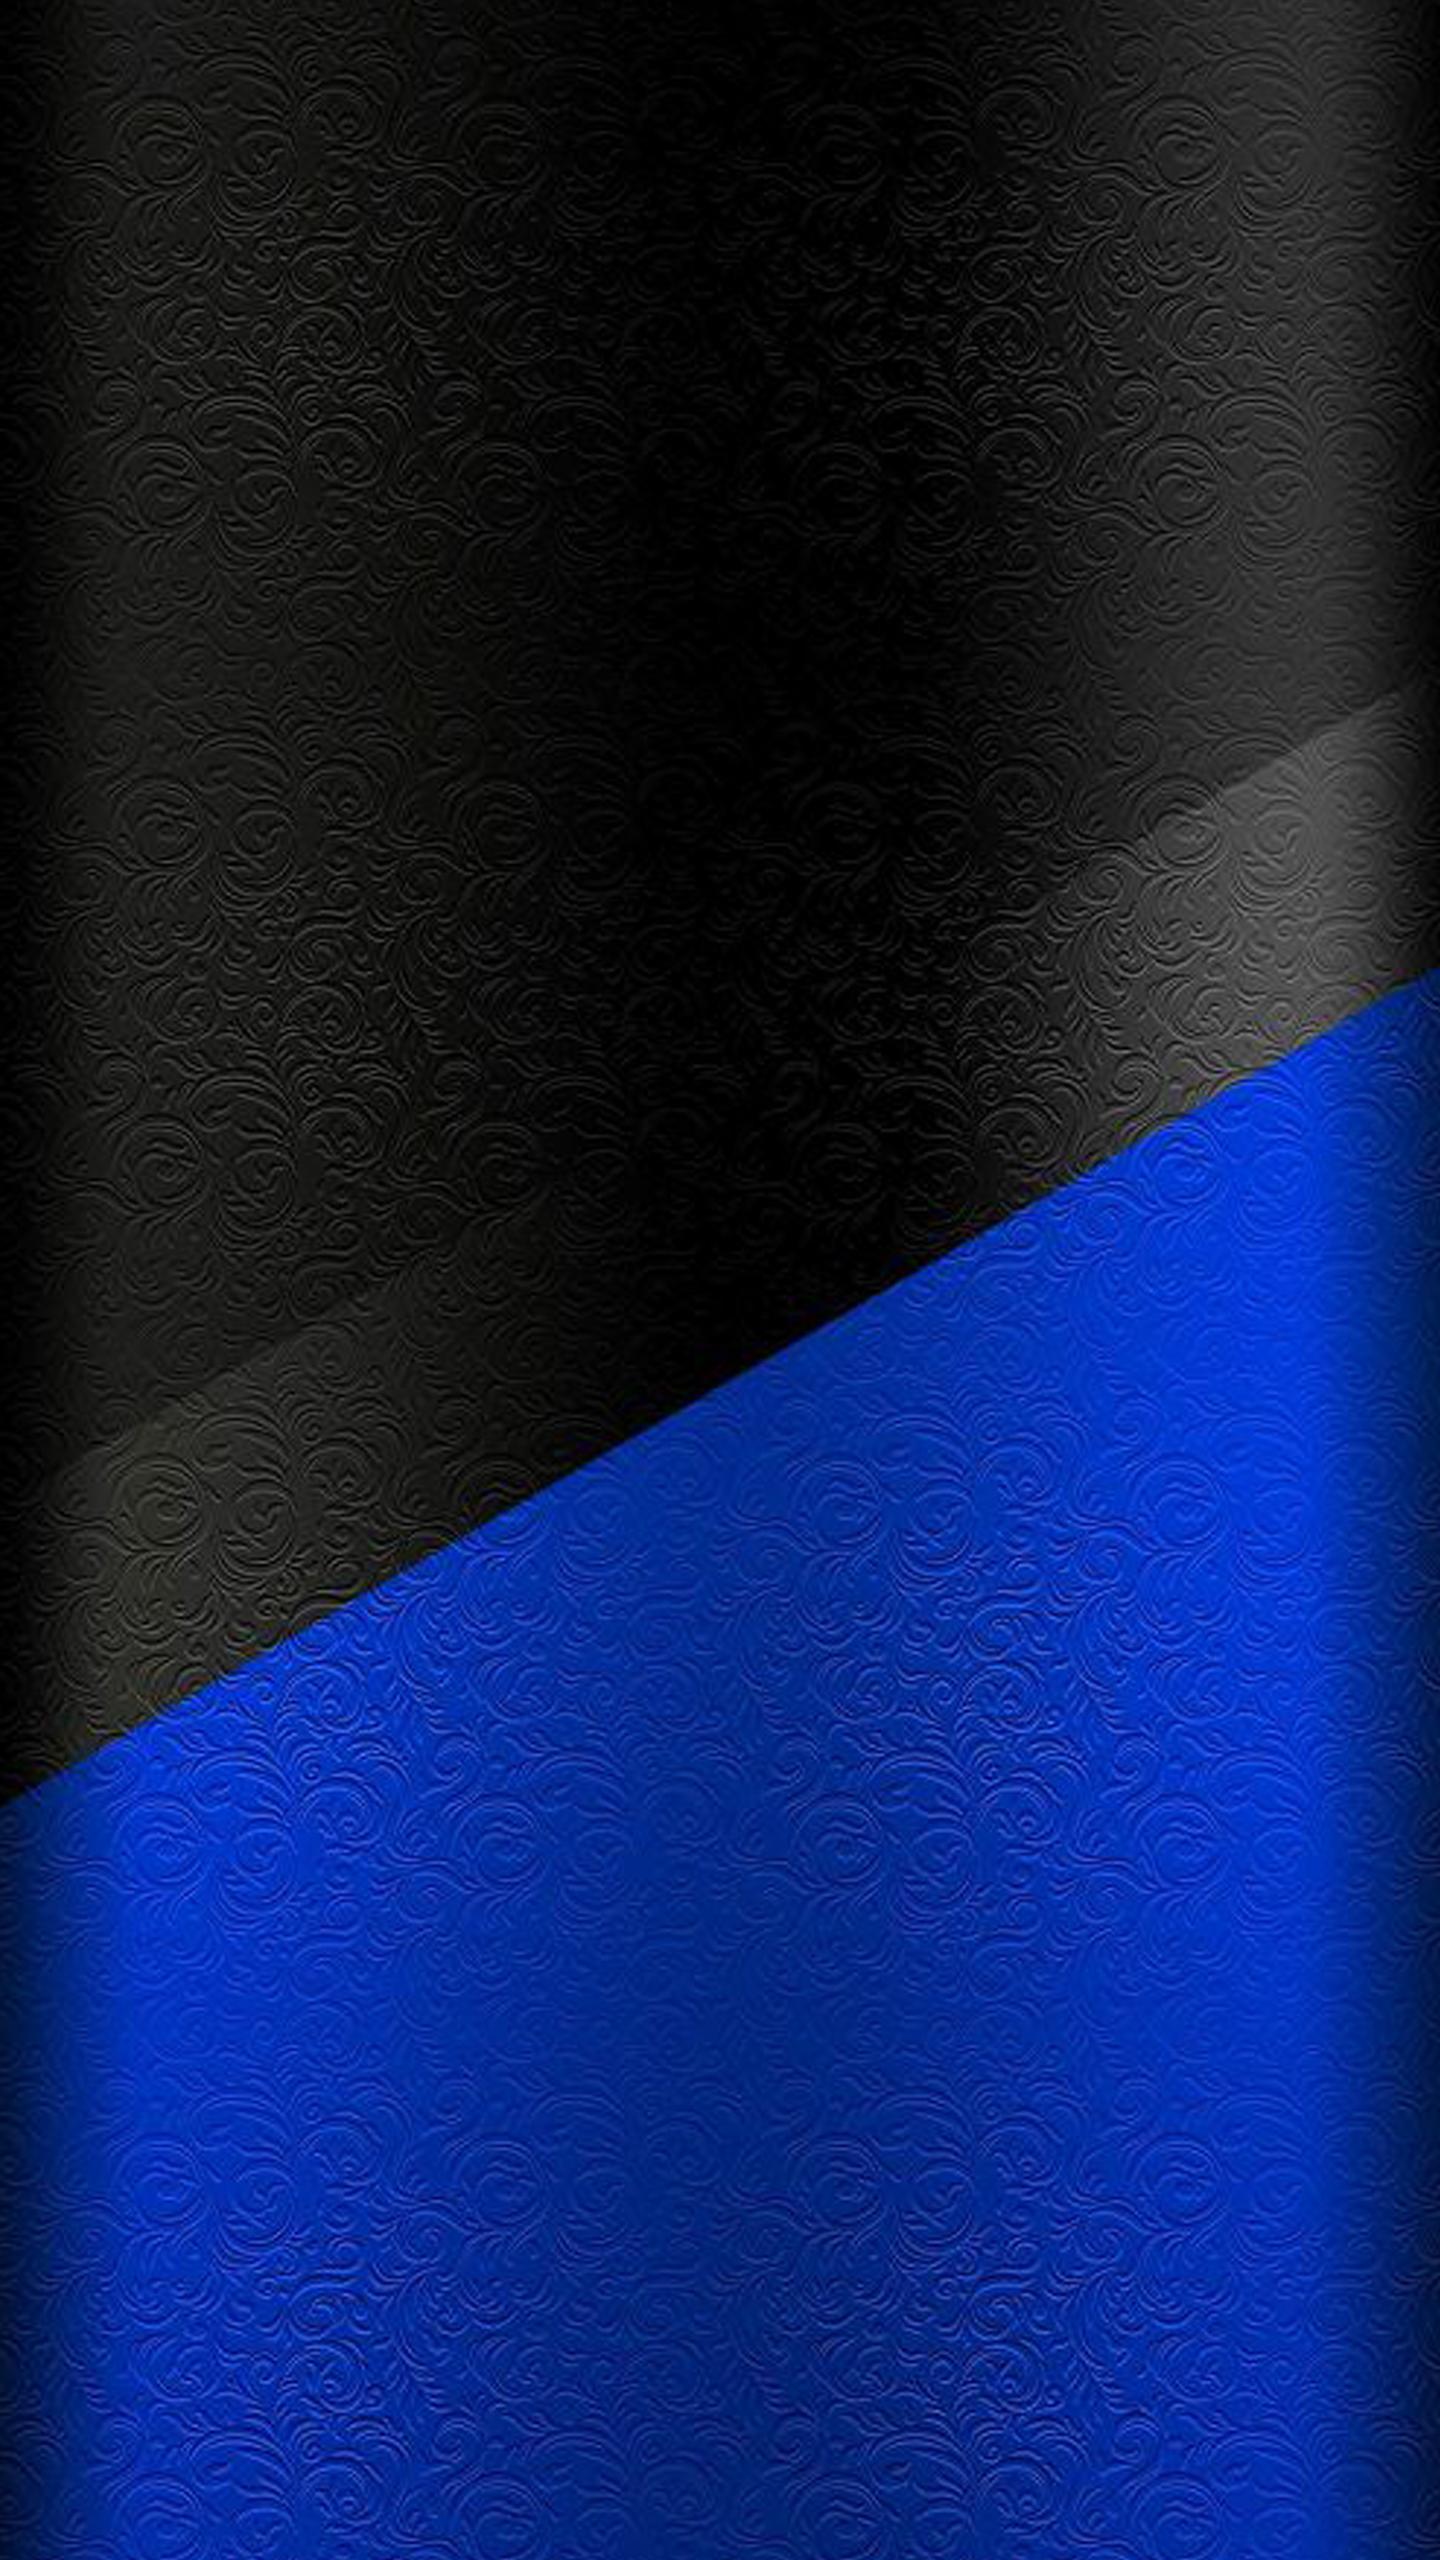 Dark S7 Edge Wallpaper 01 - Black and Blue Floral Pattern ...